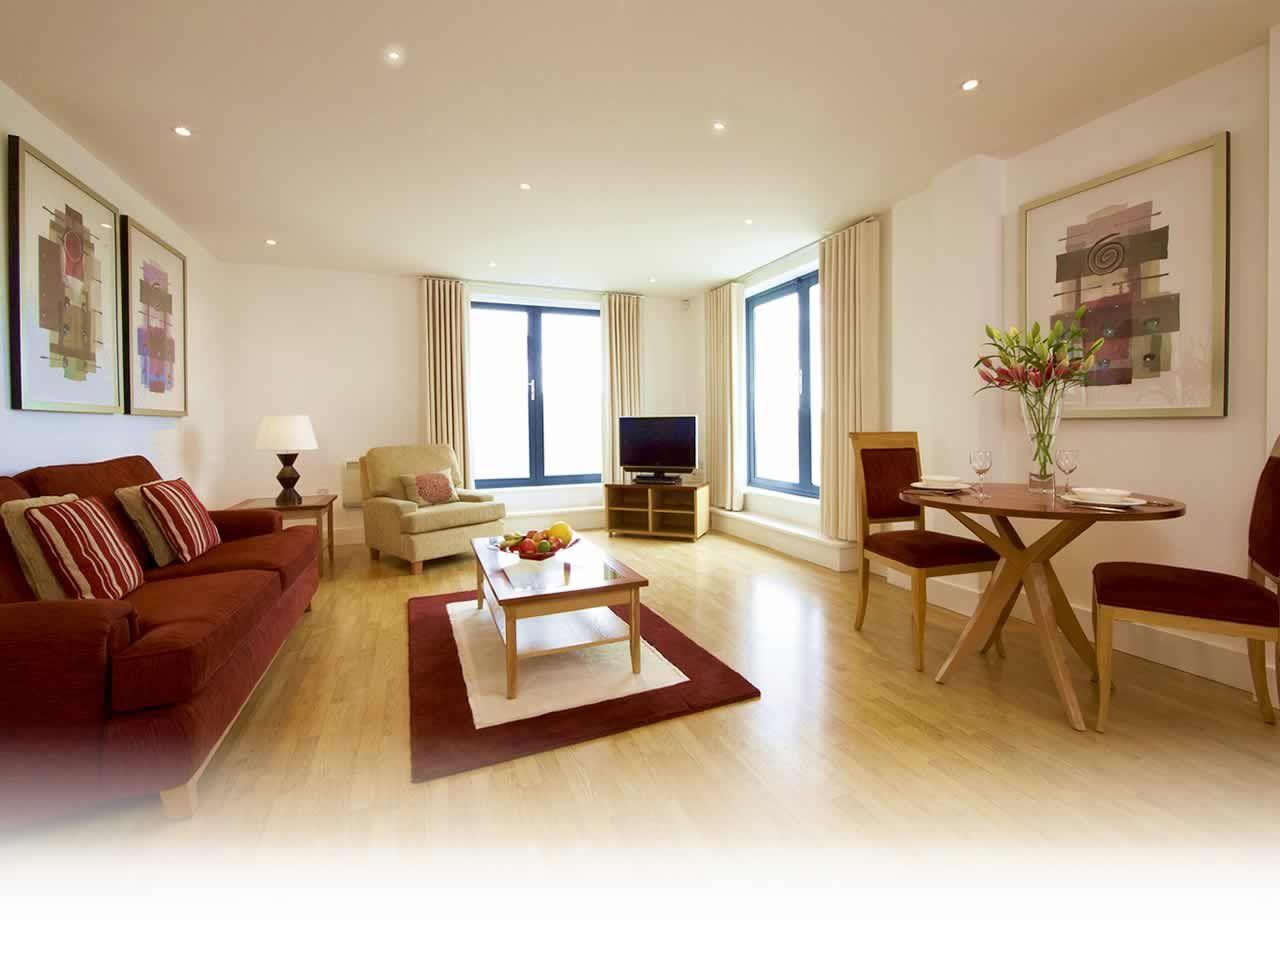 Serviced Apartments London, sin aparthotel en Londres